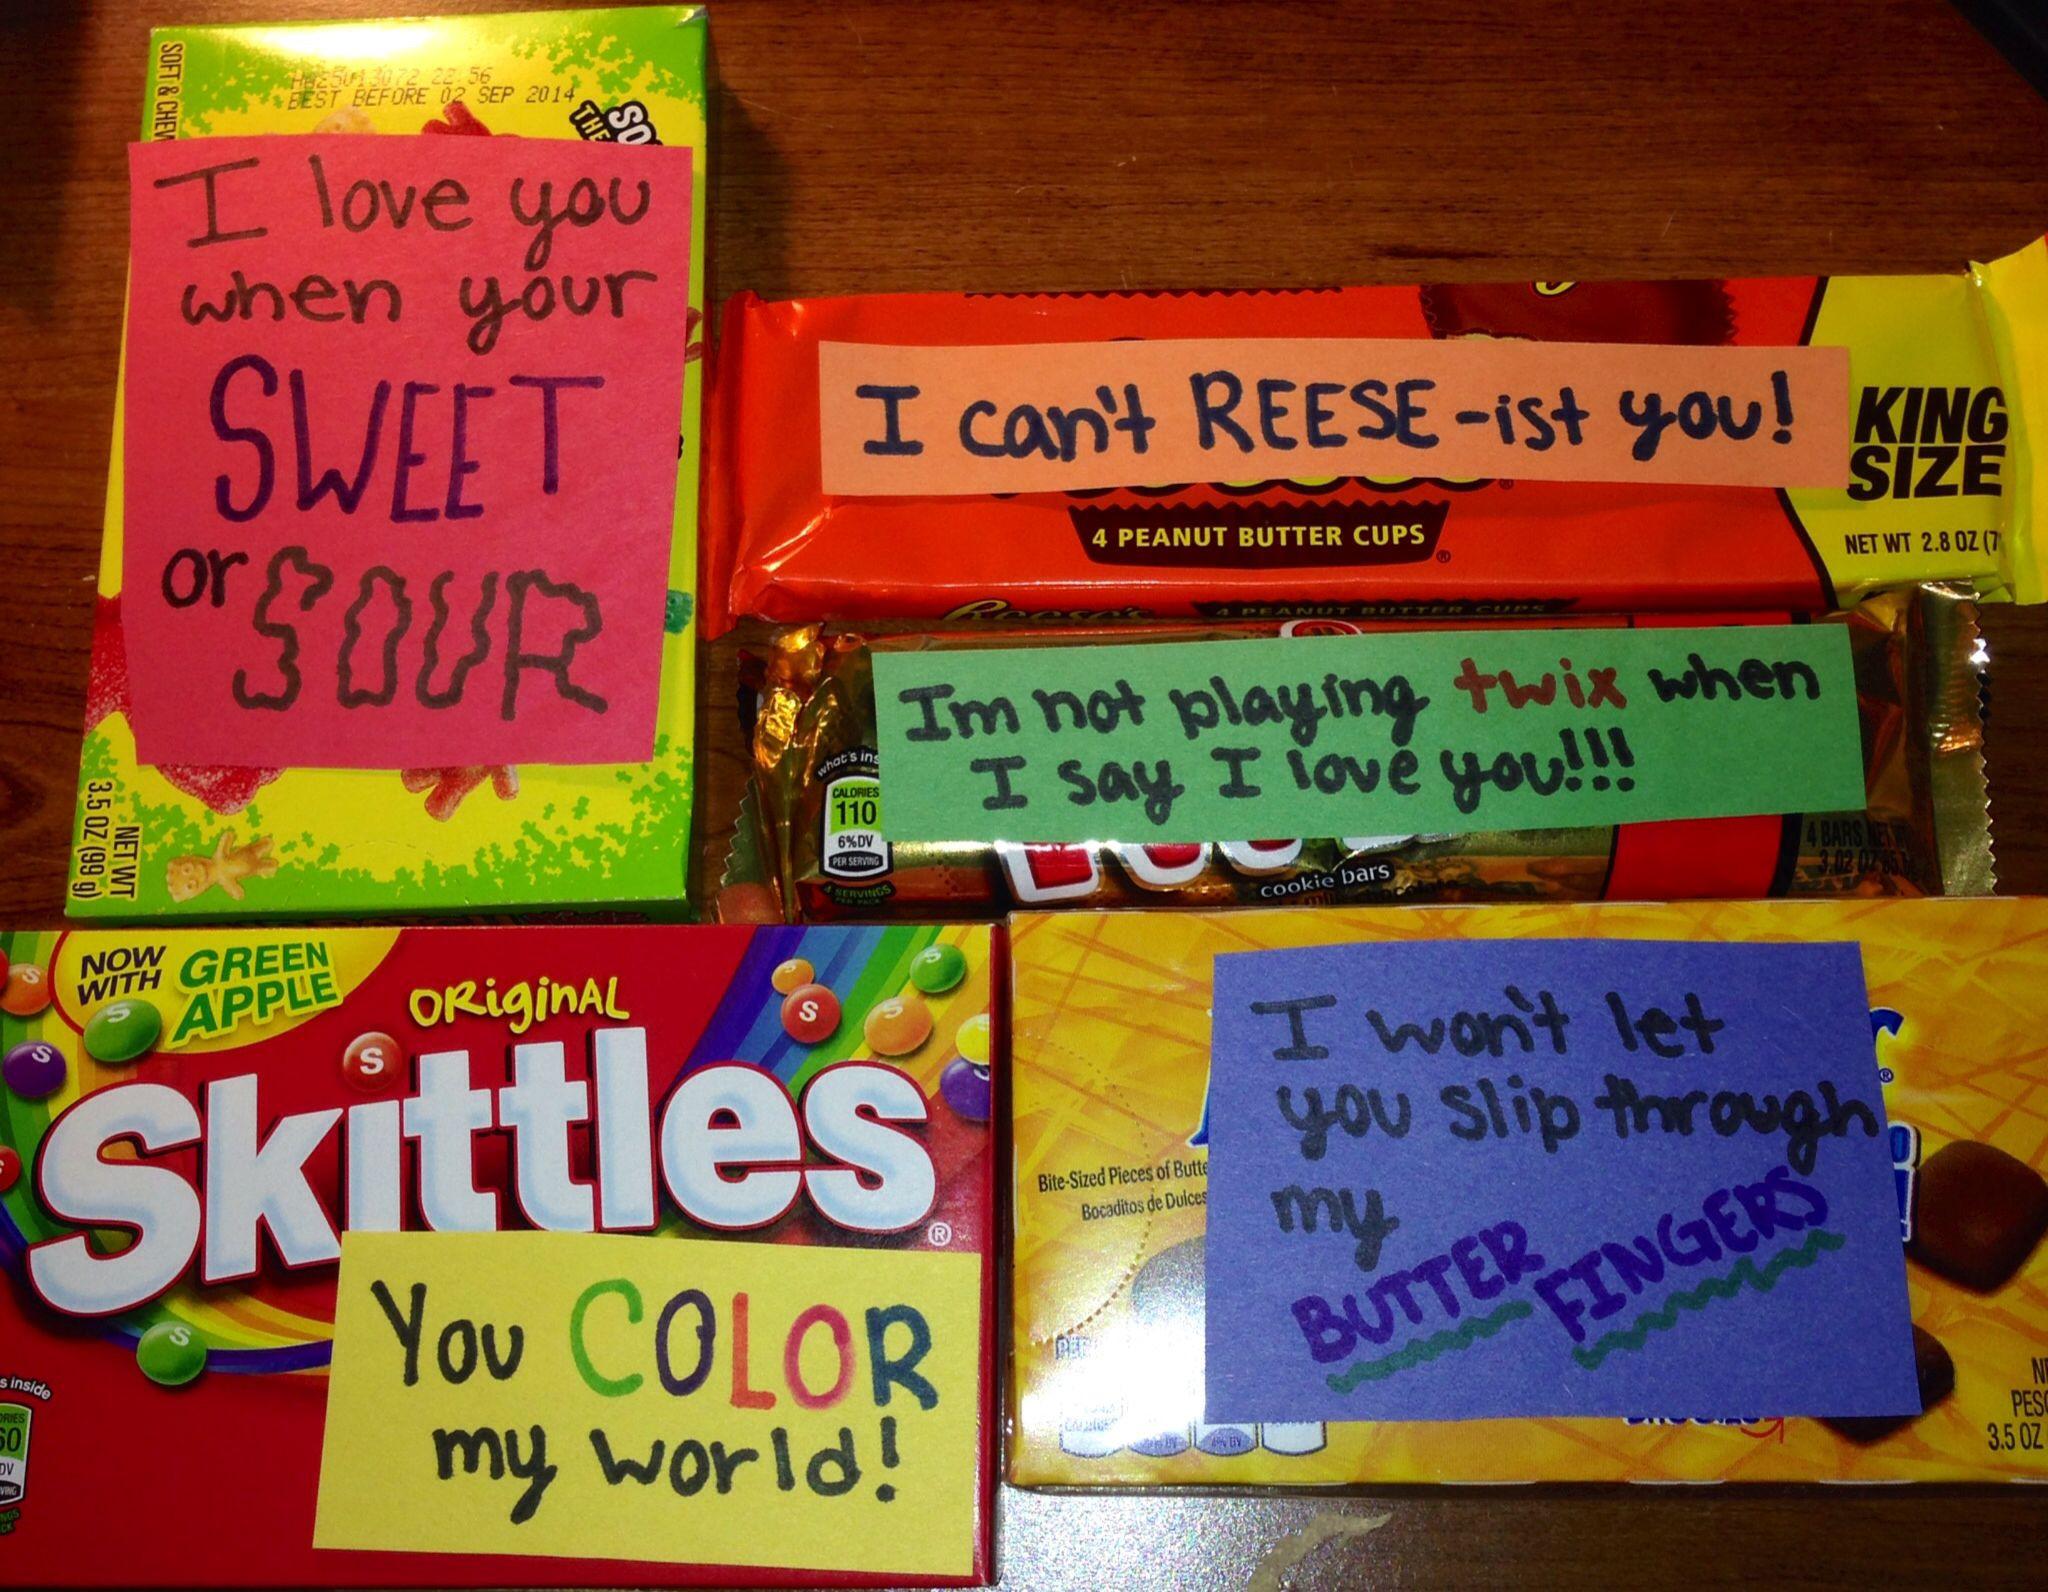 Cute Gift Ideas For Your Girlfriend  Best 25 Thoughtful ts for boyfriend ideas on Pinterest